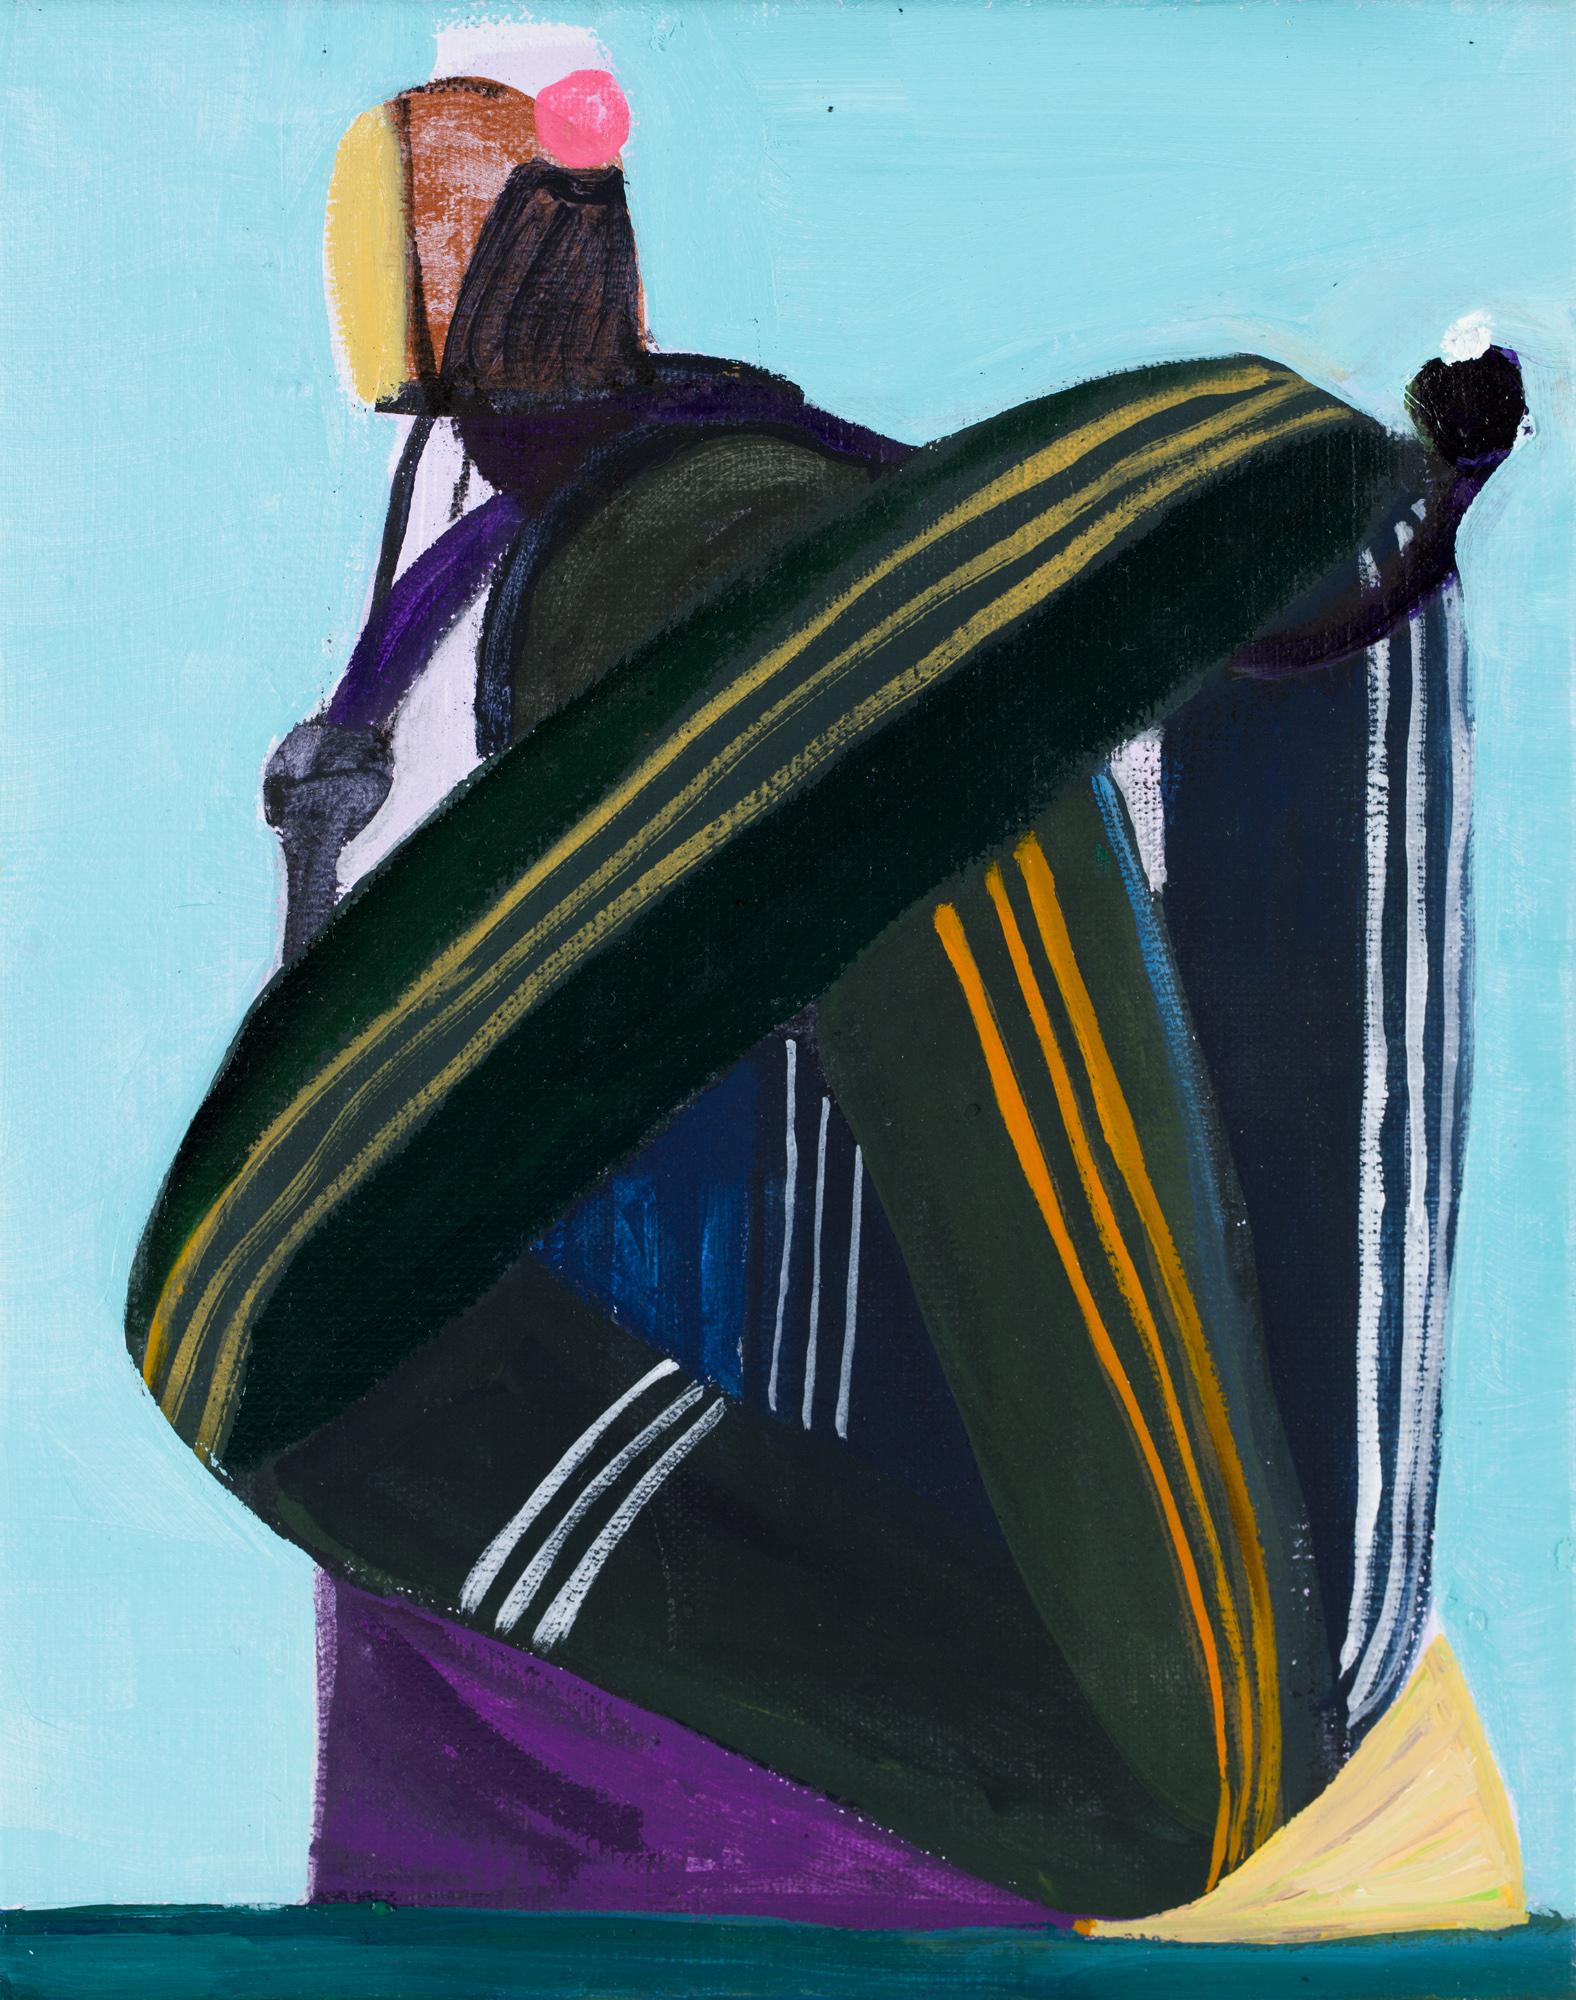 Pia Mauno  Adidas i idévärlden #6  2019 Vinyl paint and oil on canvas 24 x 19 cm